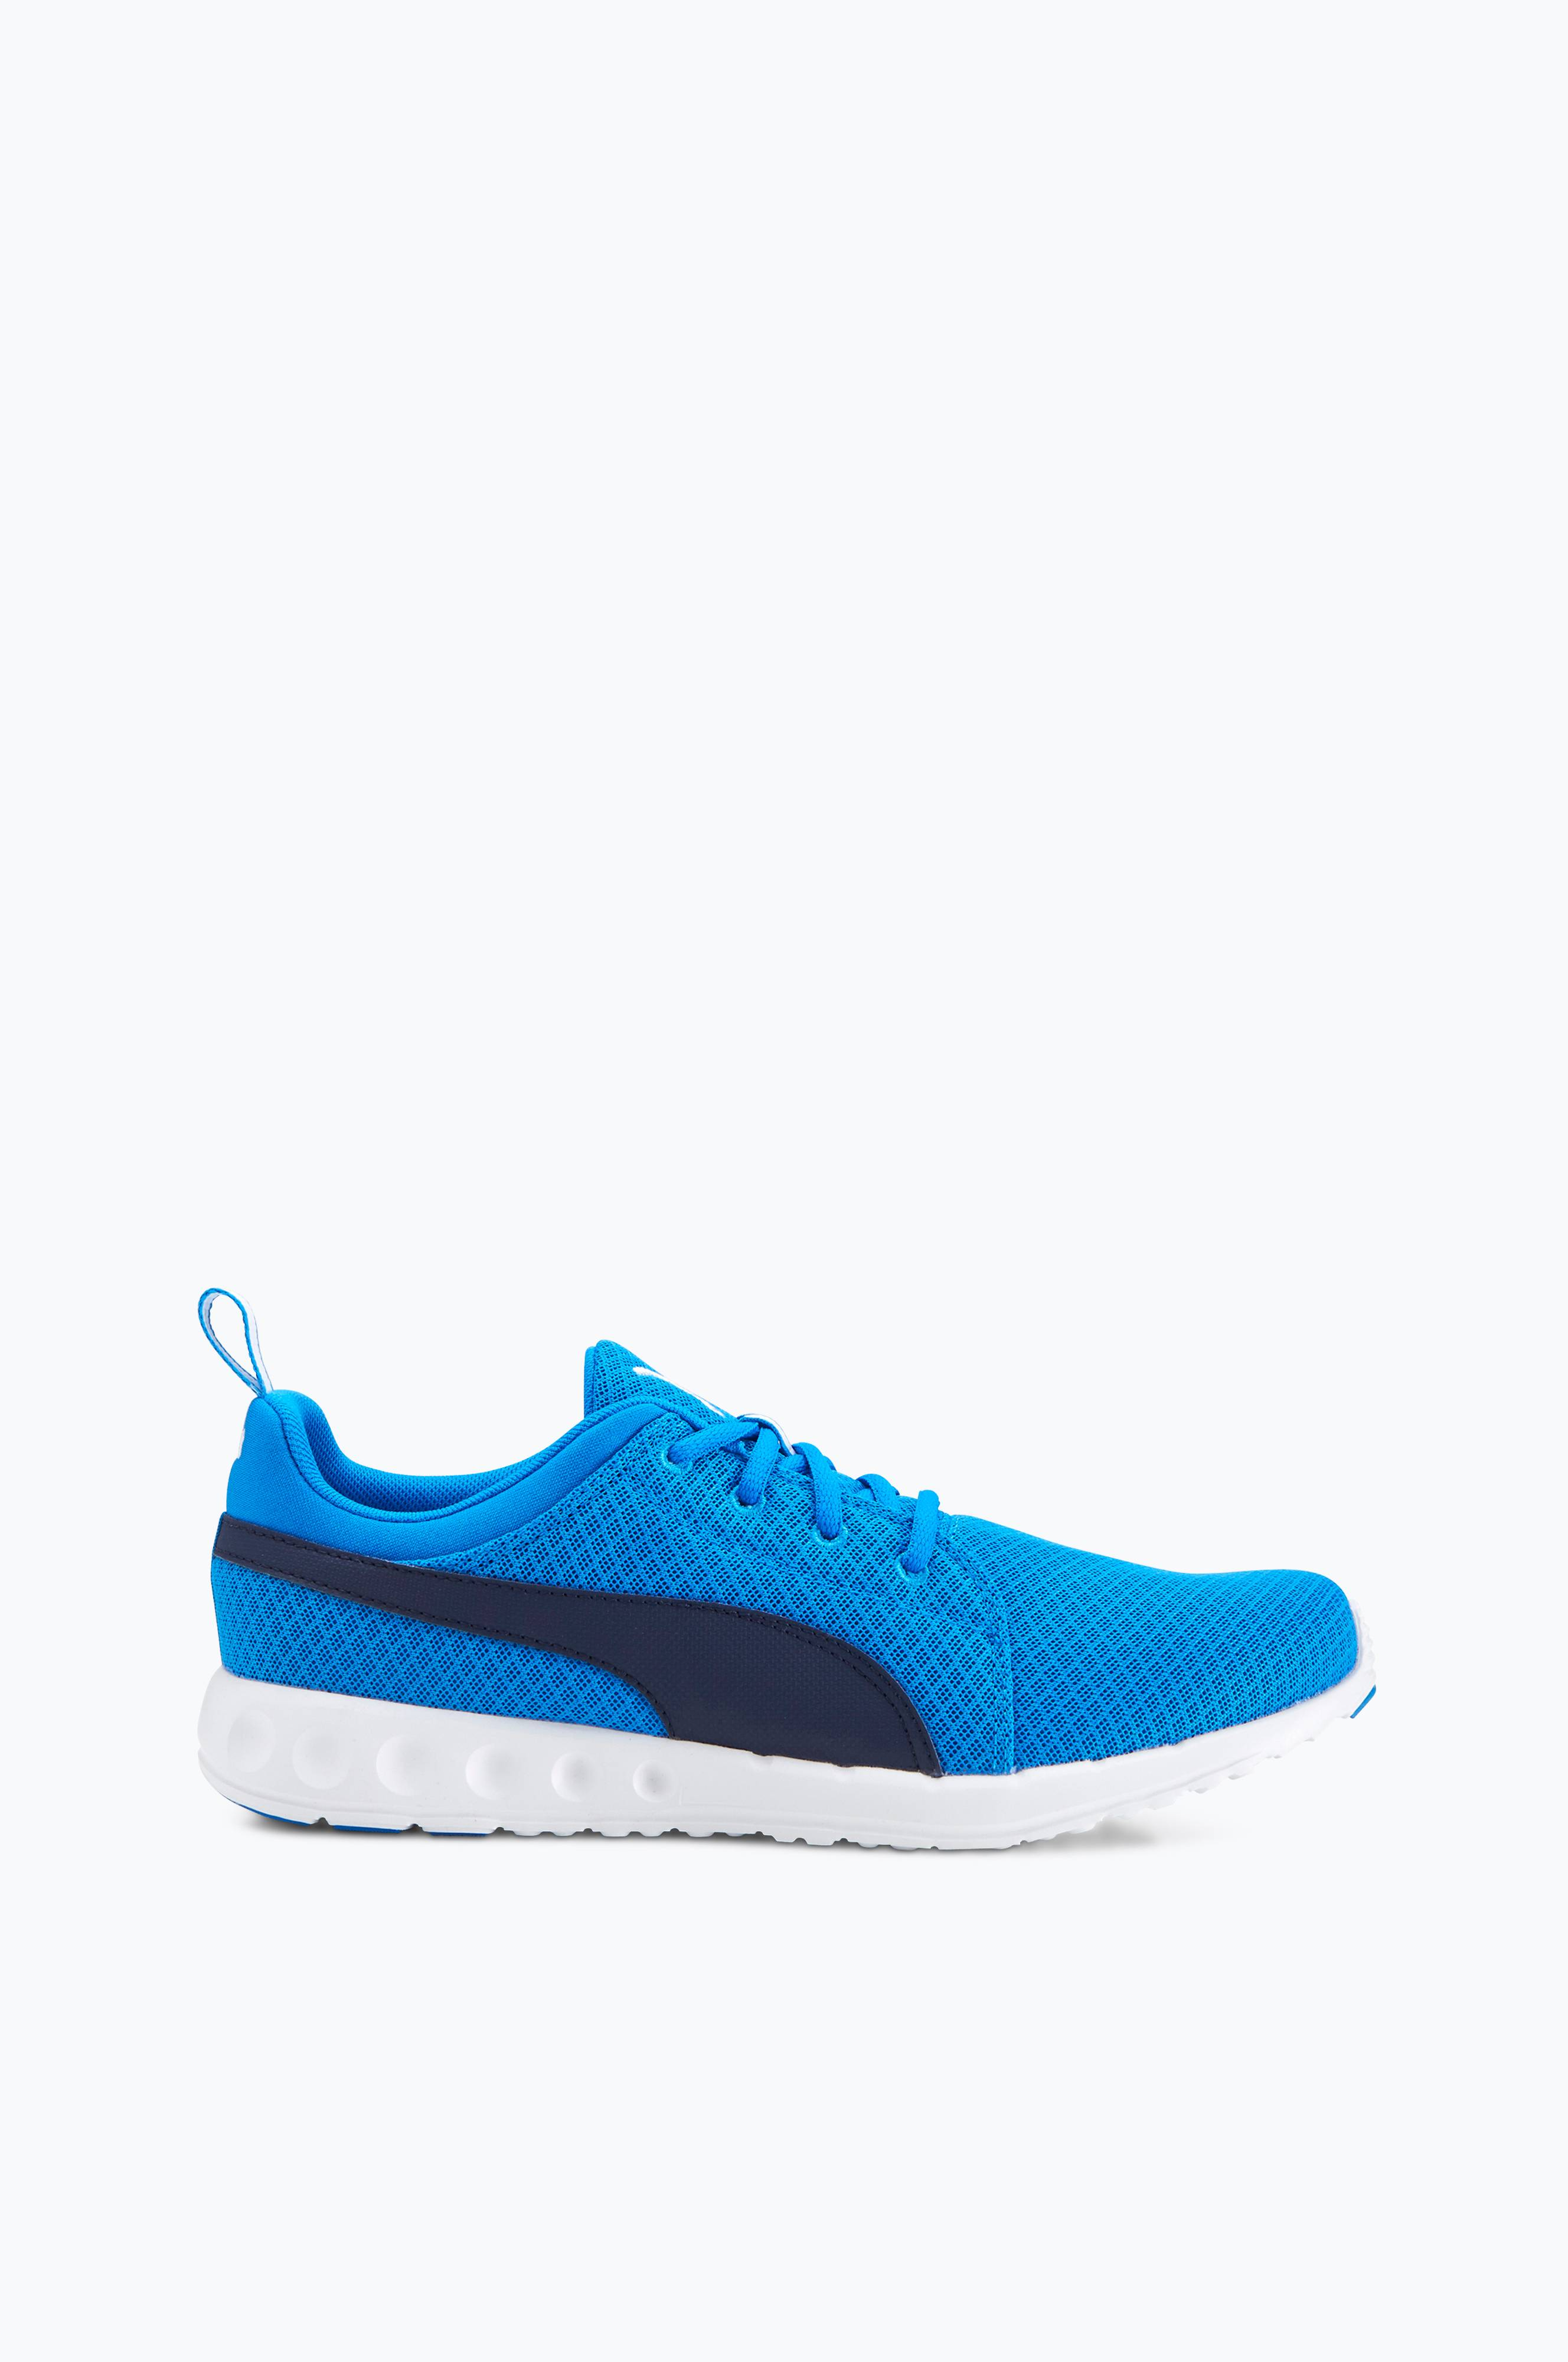 Puma Sneakers Carson Mesh Blå Herre Ellos.dk